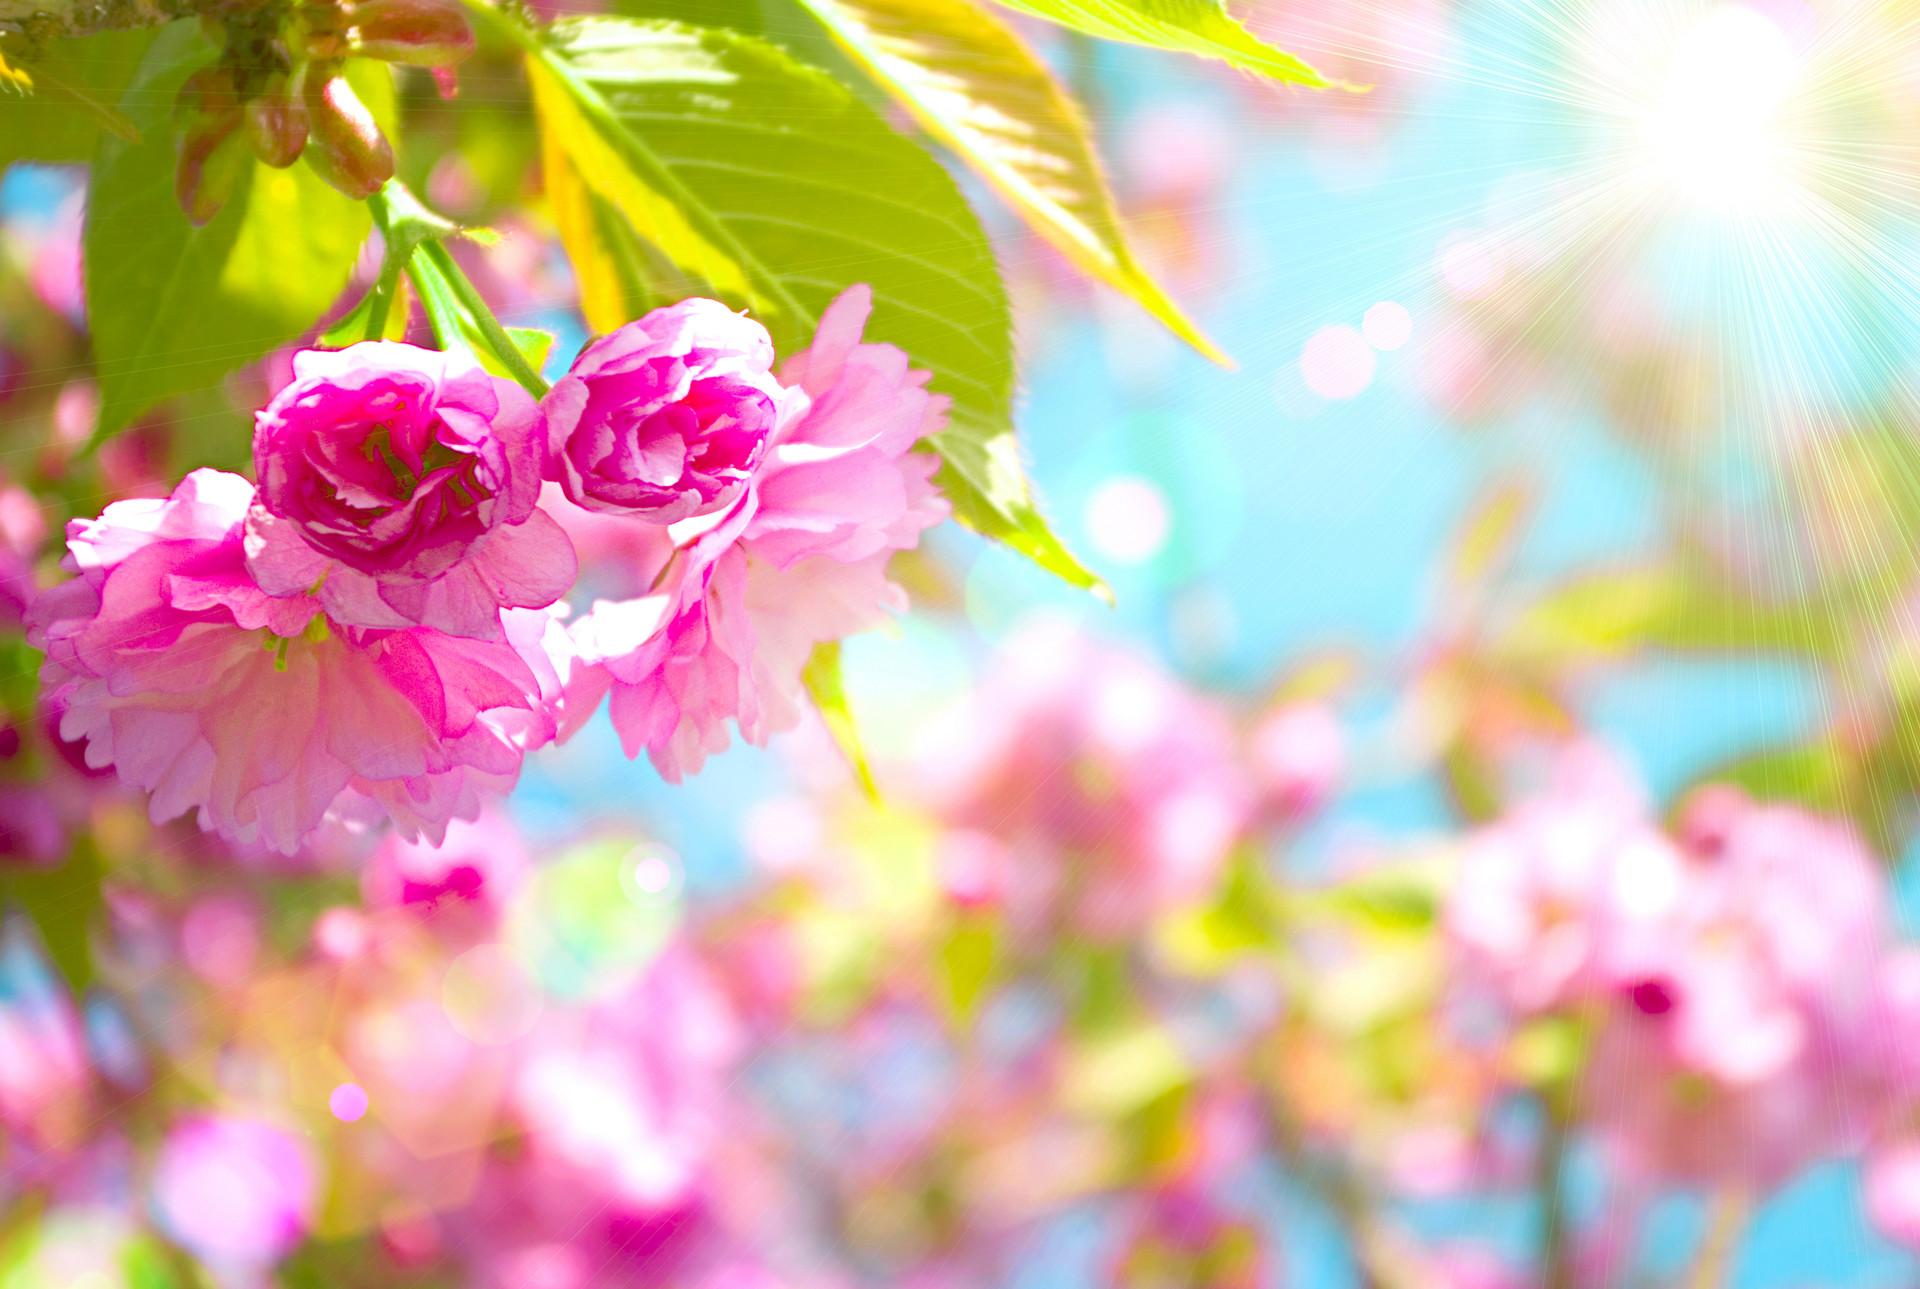 Art Images Spring Desktop Wallpaper HD.